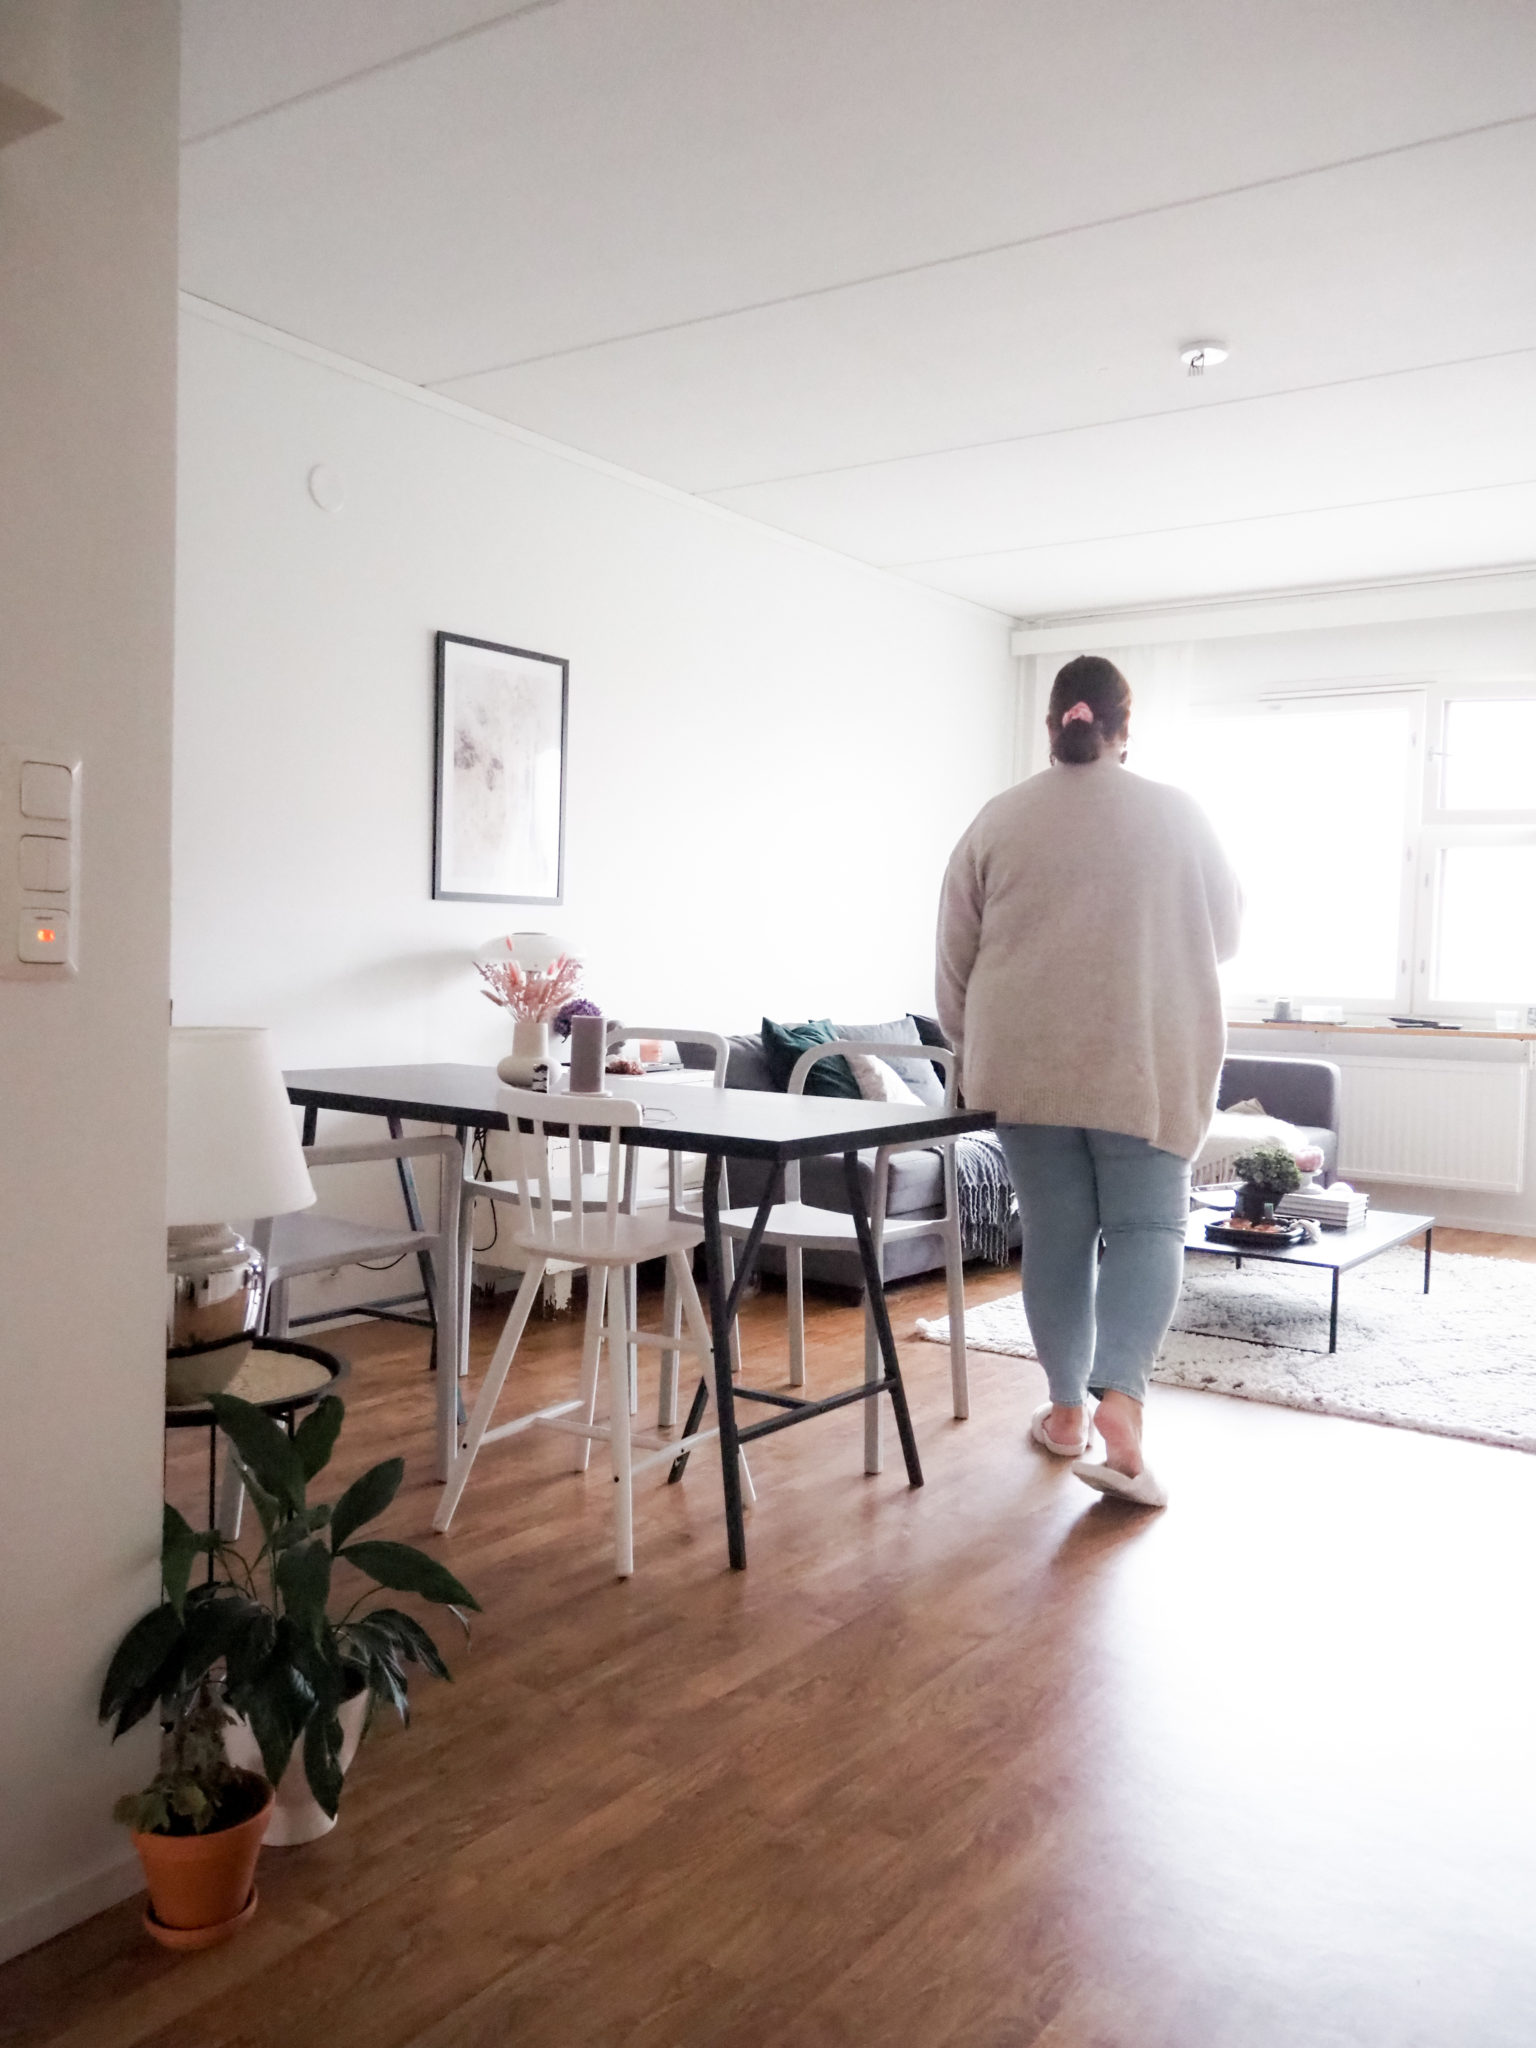 Olohuone - Uusi koti - BMH - Big mamas home by Jenni